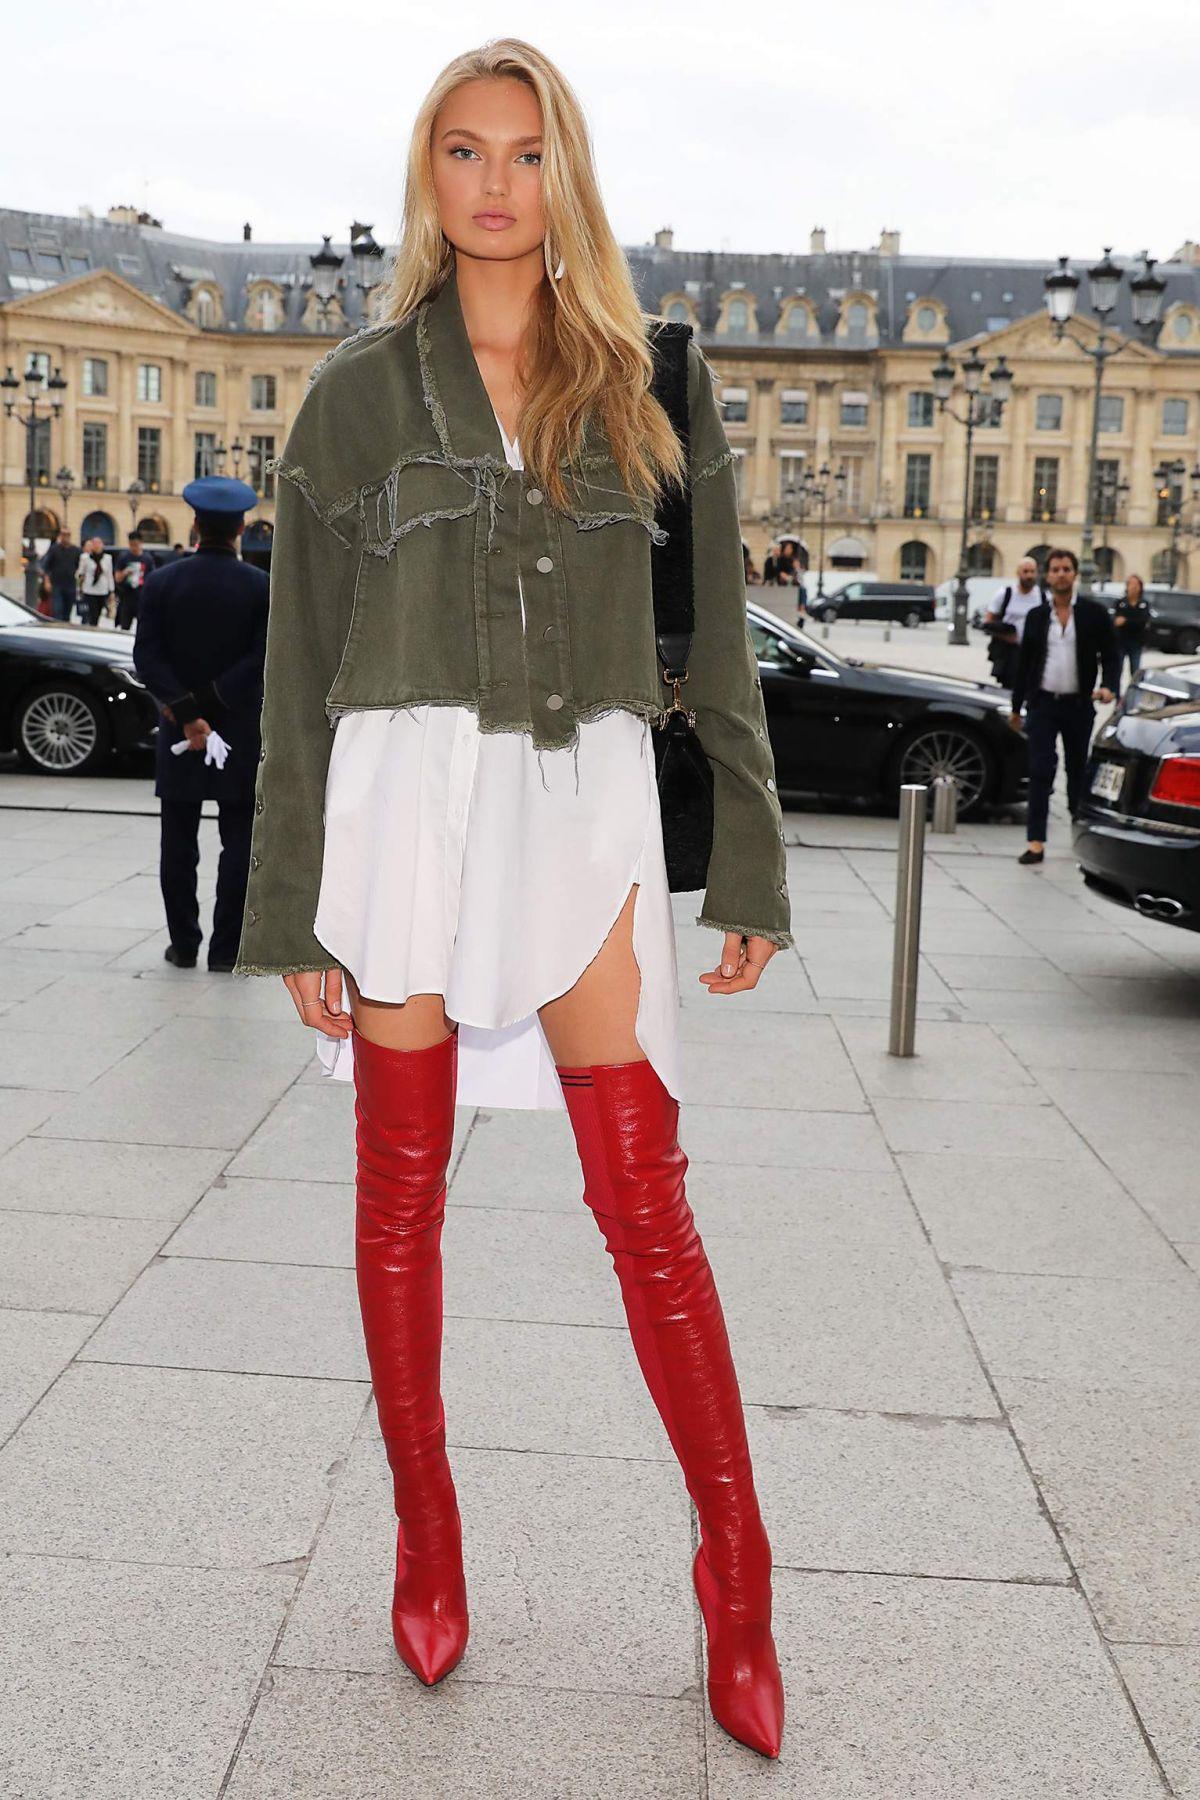 Romee Strijd Romee-strijd-out-at-paris-fashion-week-09-29-2017-1